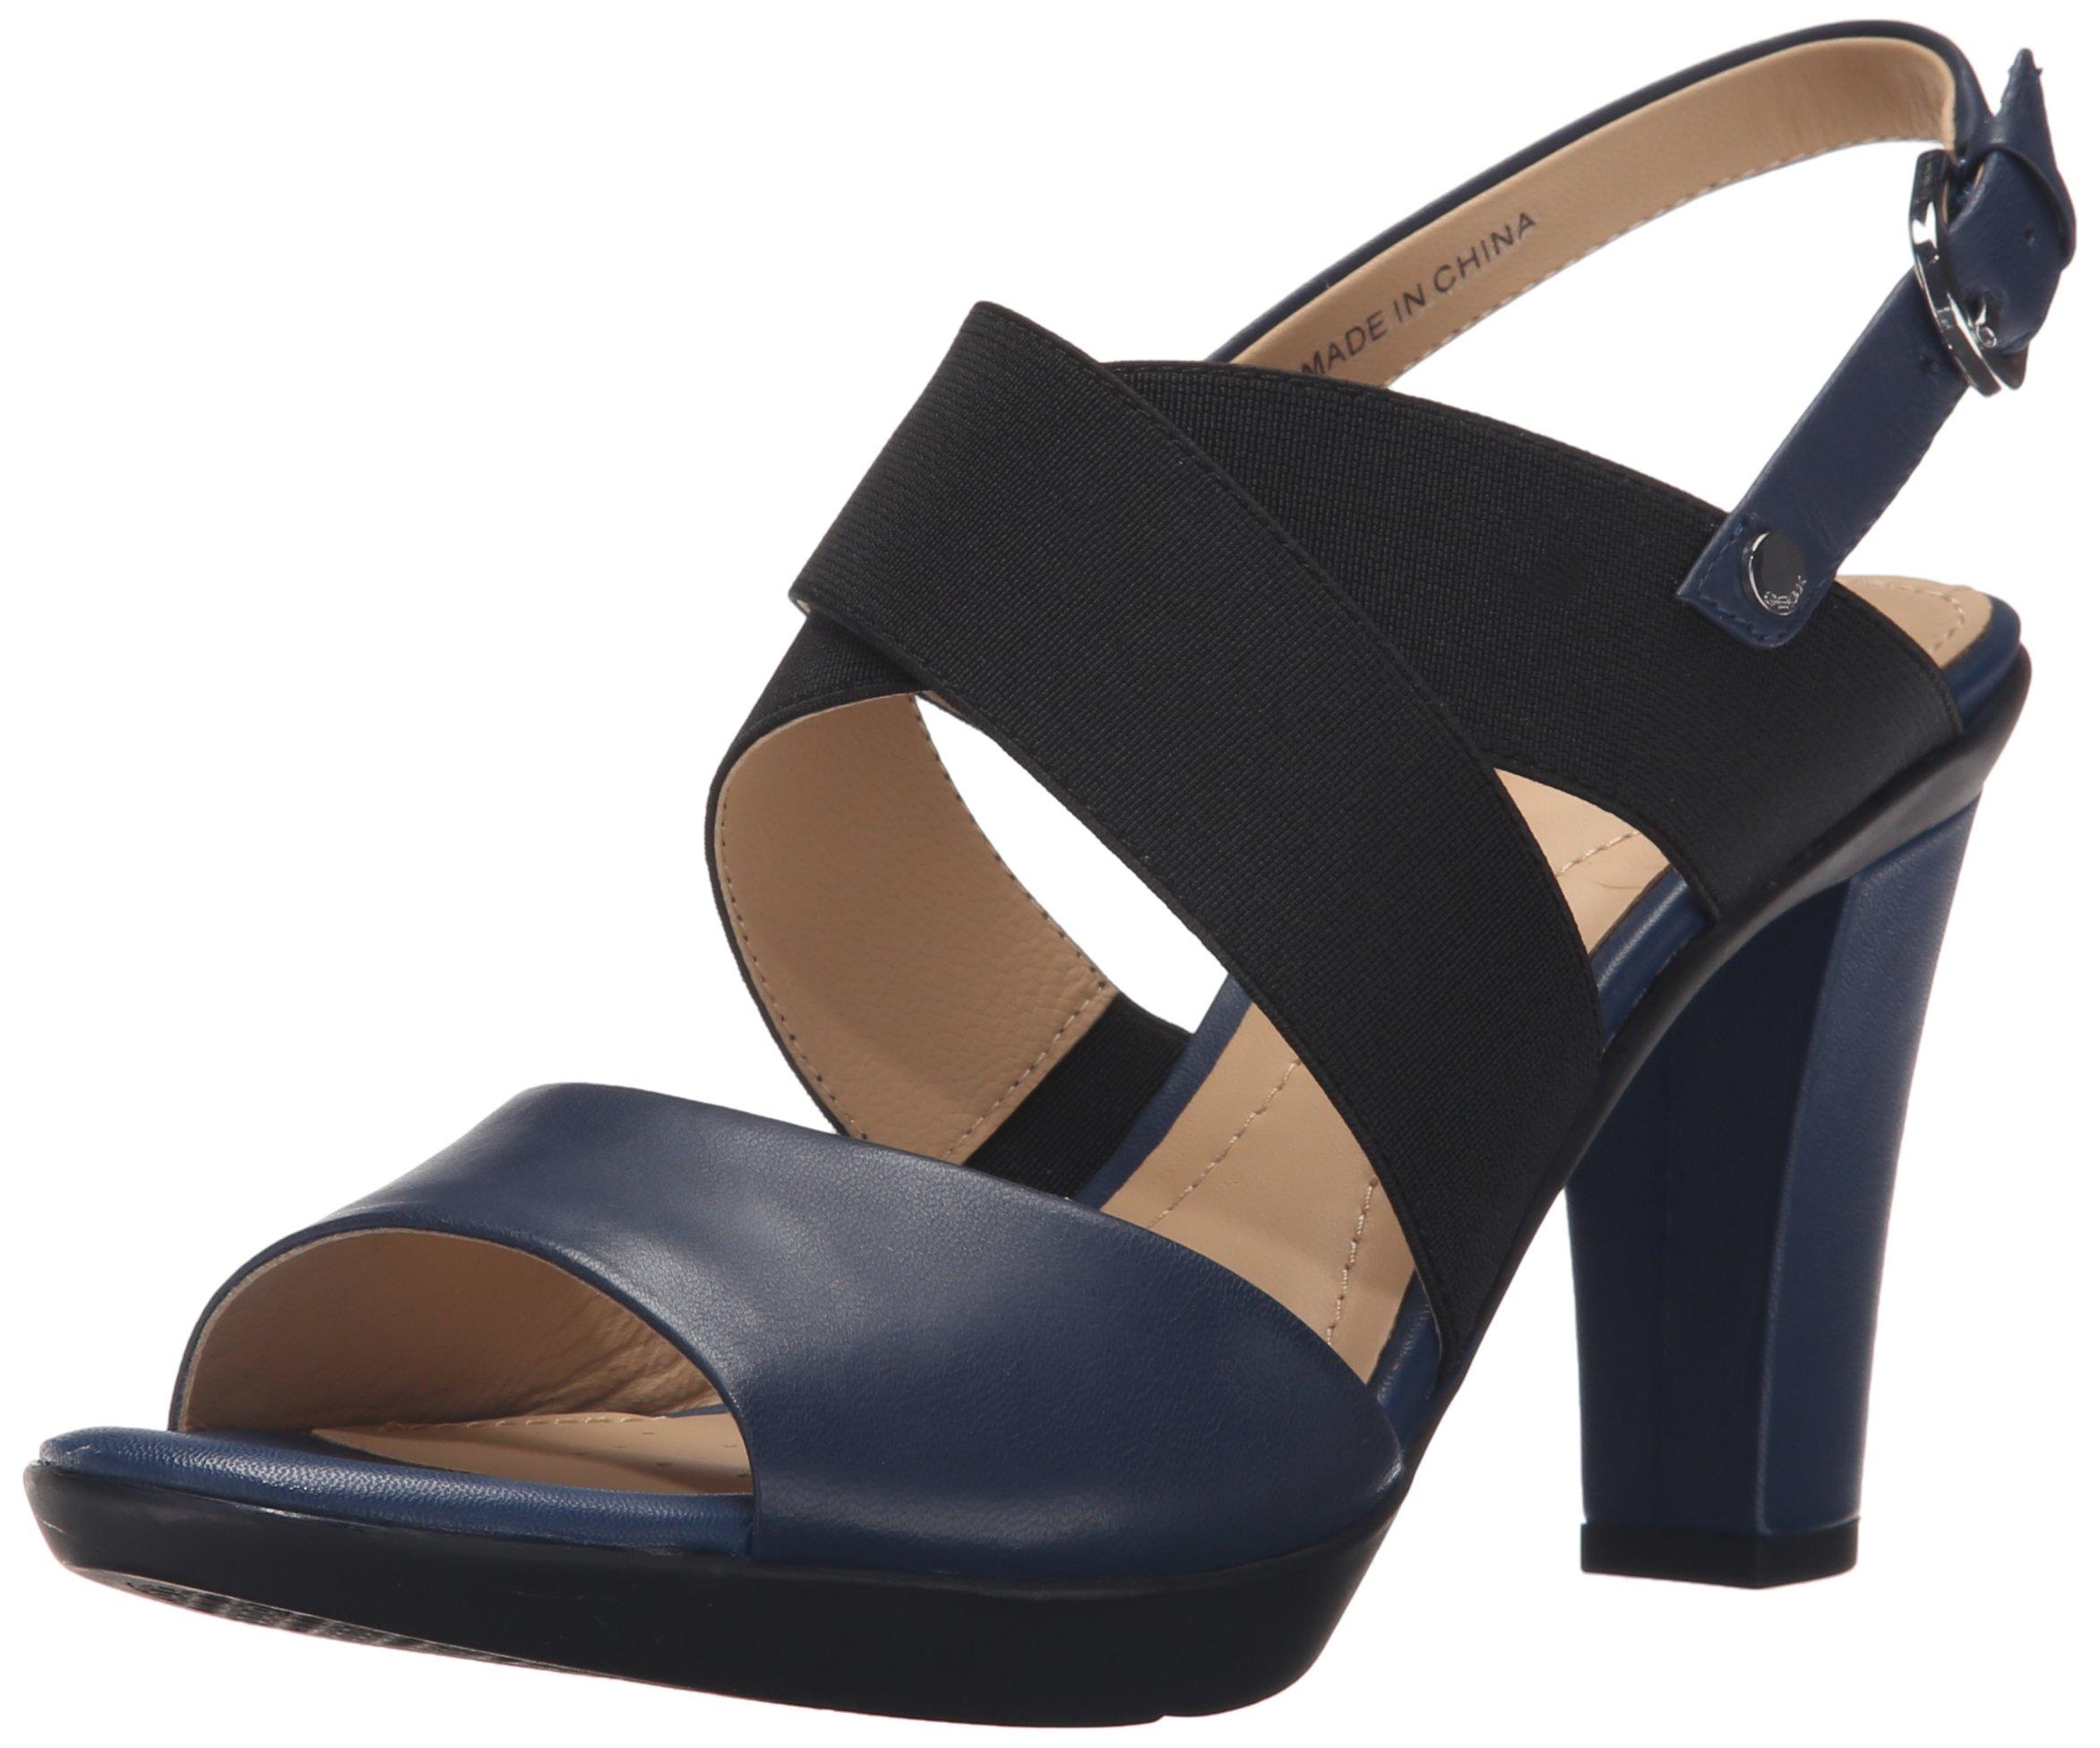 Geox Women's D Jadalis Dress Sandal, Dark Royal/Black, 38.5 EU/8.5 M US